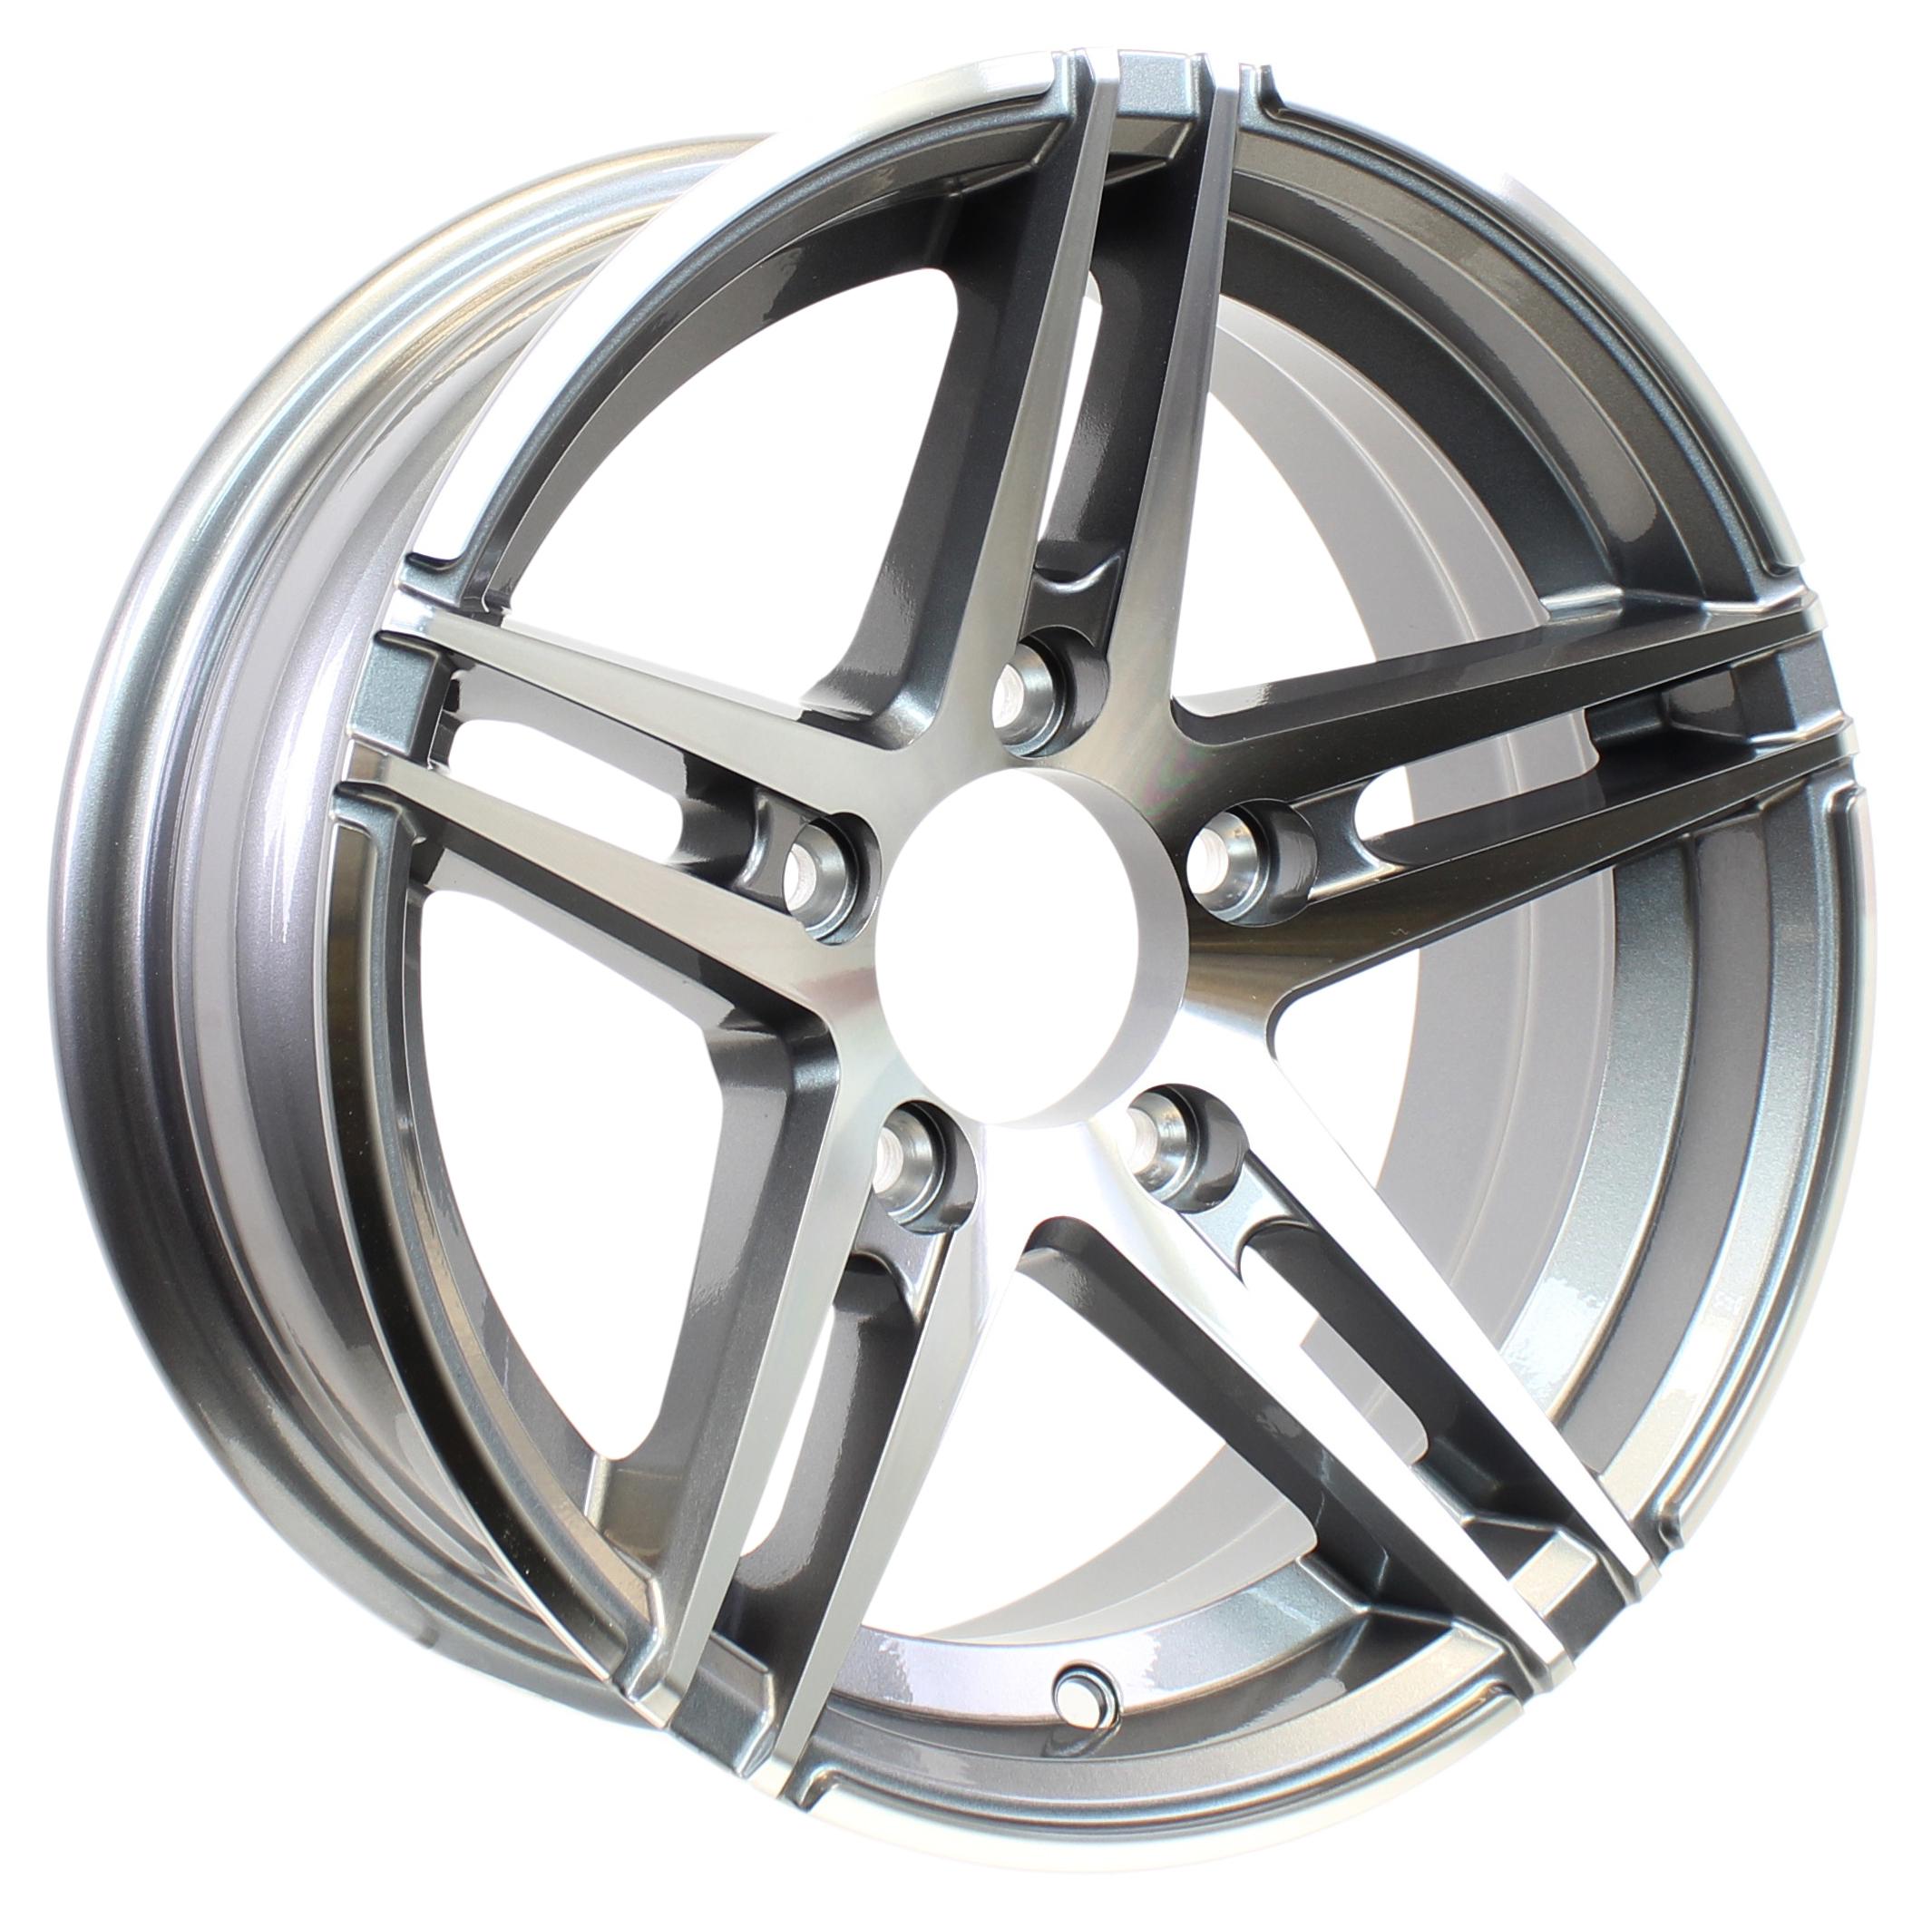 Sidewinder 14x5.5 5-4.5 Gun Metal Aluminum Trailer Wheel Image